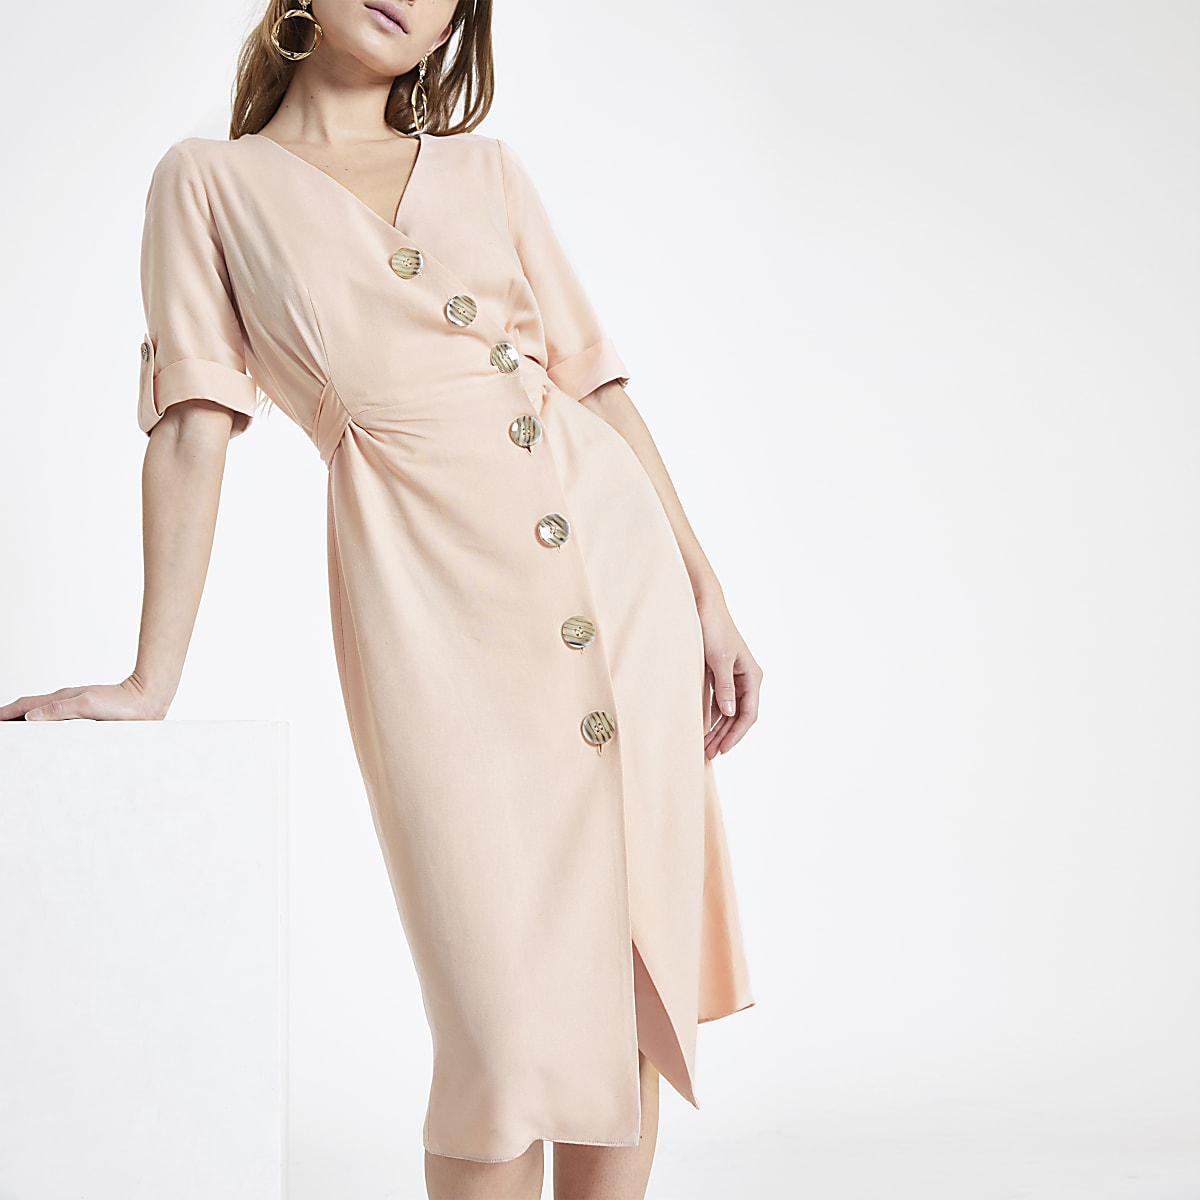 RI Petite - Midi-jurk met knopen voor